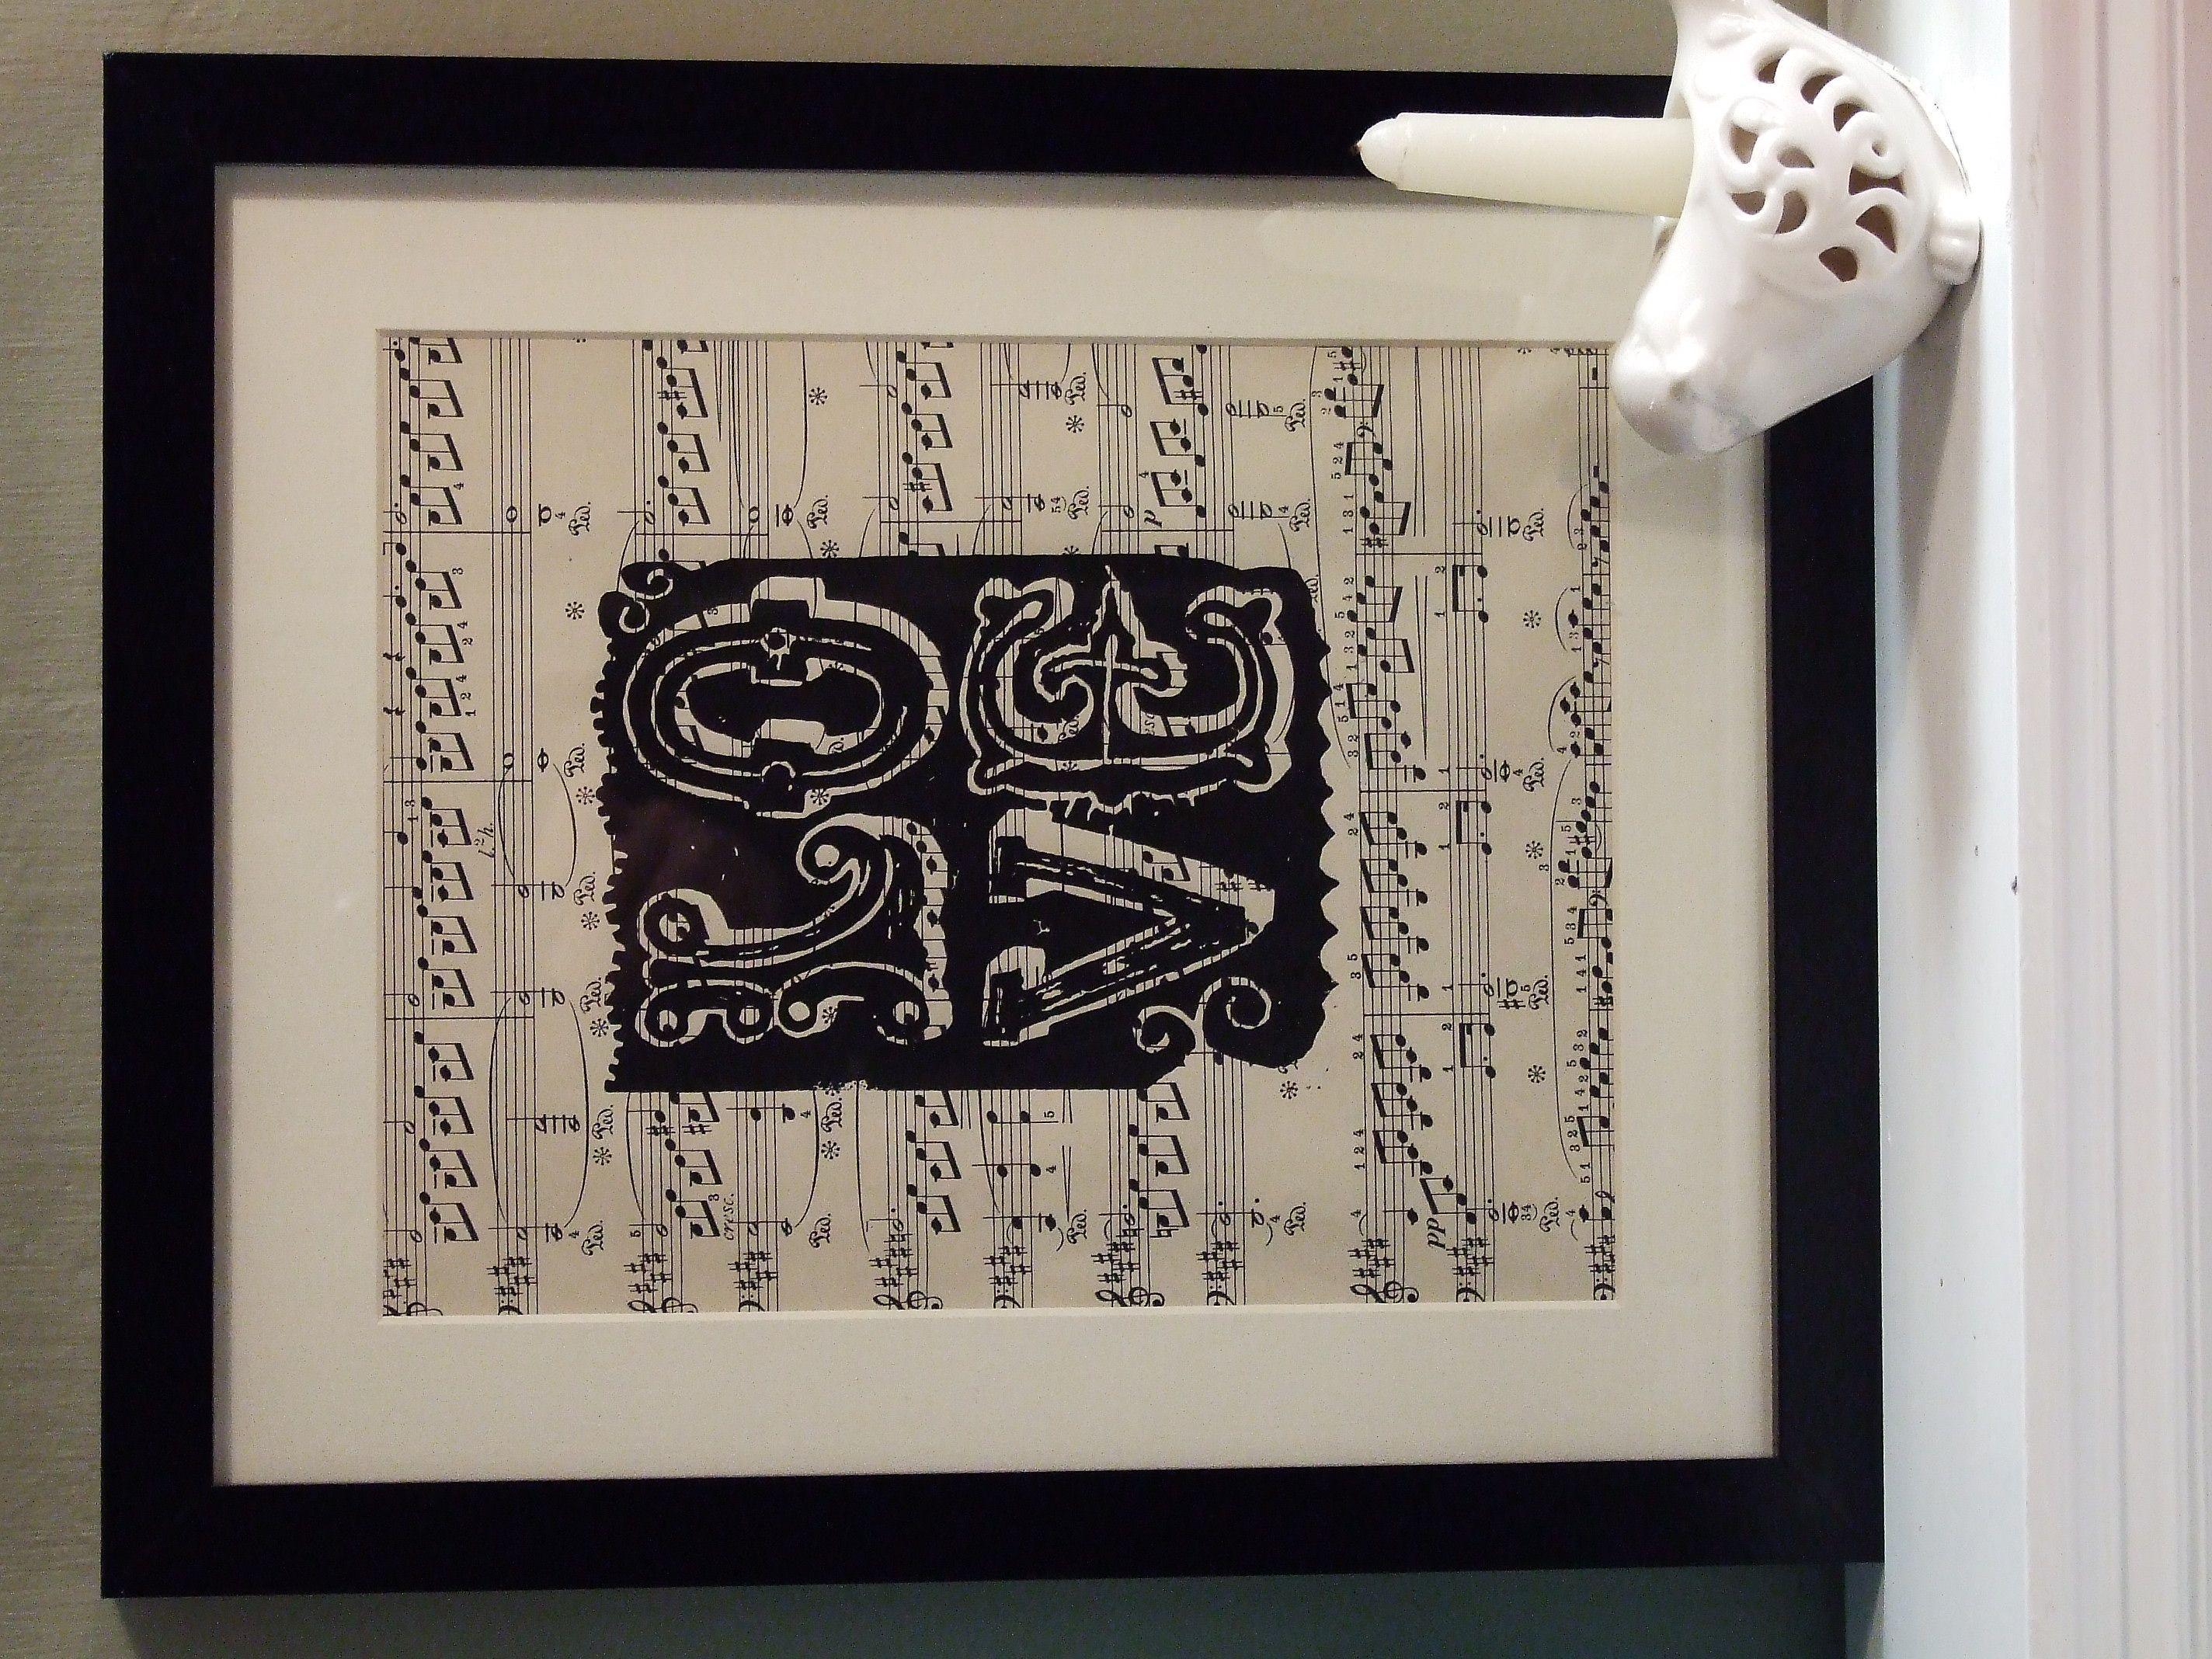 Handprinted Vintage Sheet Music Love Print #vintagesheetmusic Handprinted Vintage Sheet Music Love Print #vintagesheetmusic Handprinted Vintage Sheet Music Love Print #vintagesheetmusic Handprinted Vintage Sheet Music Love Print #vintagesheetmusic